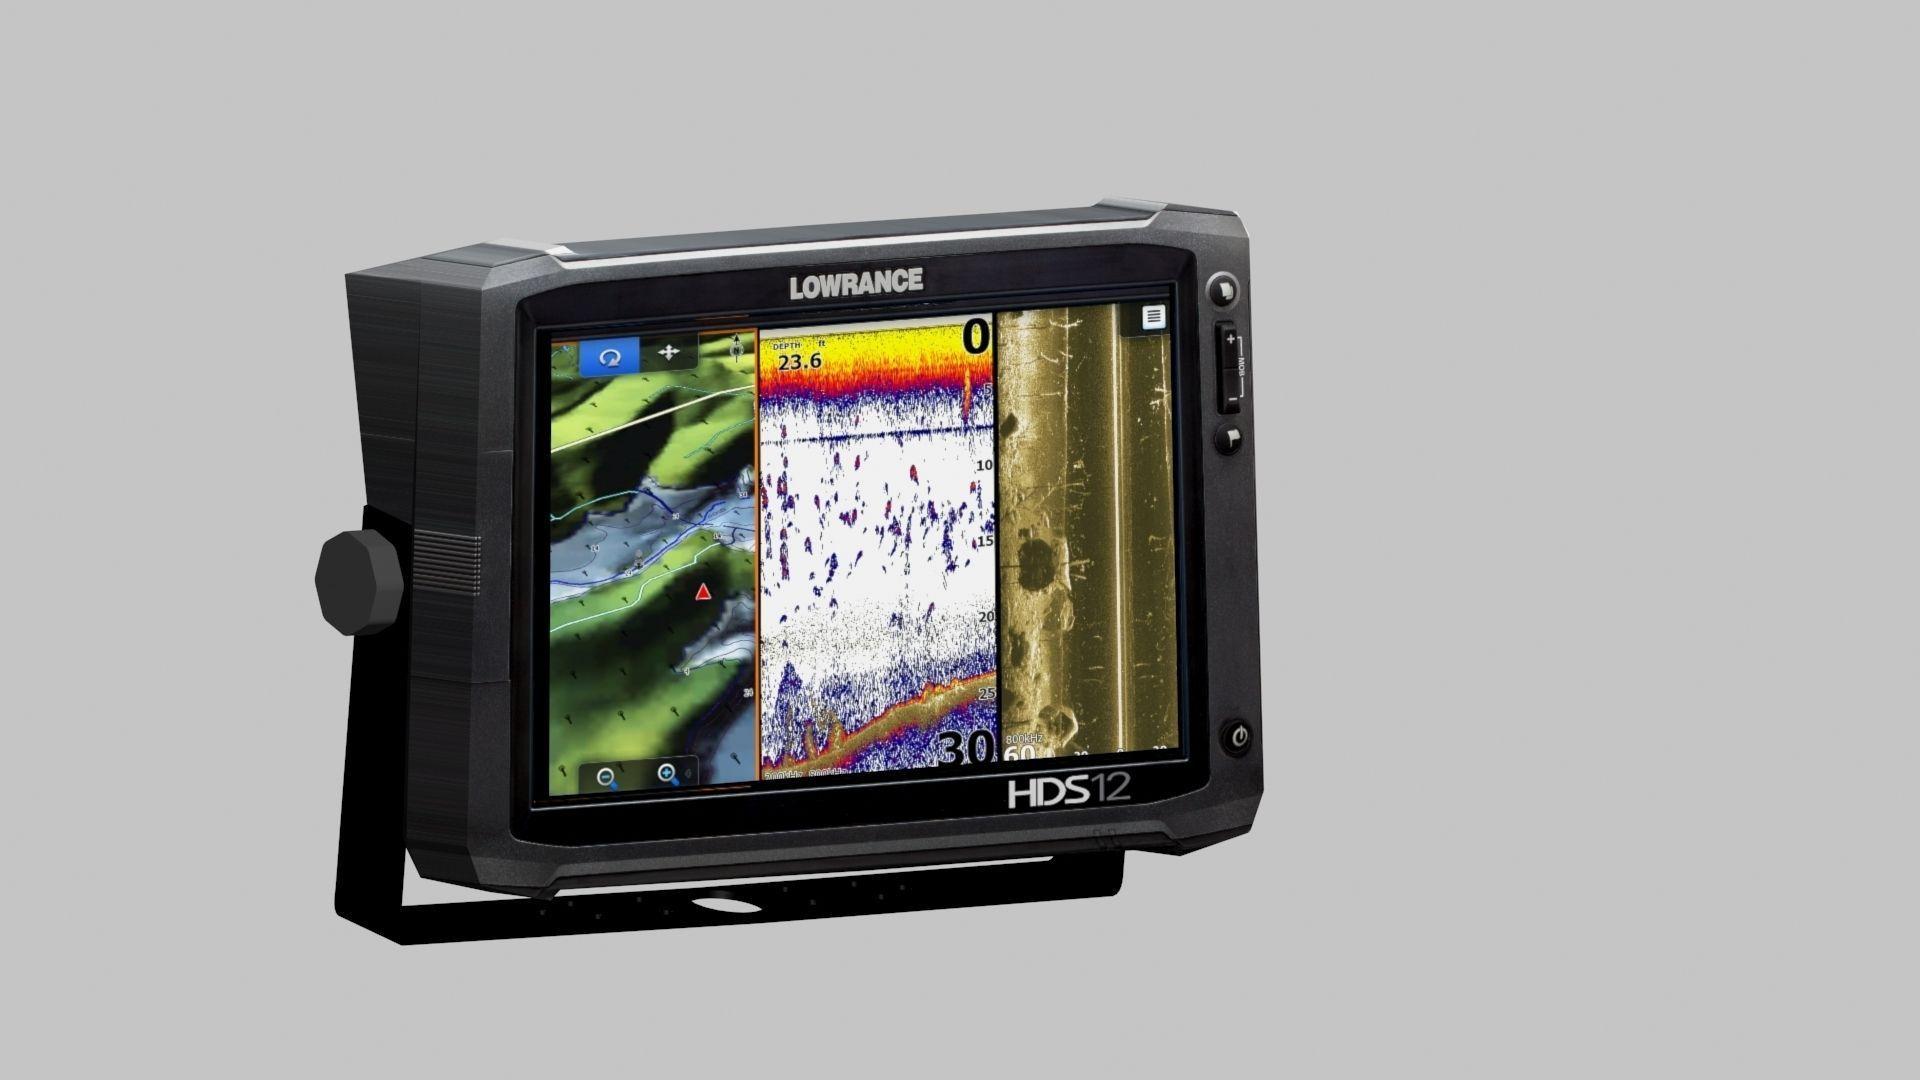 Lowrance Fish Finder 3D Model max  CGTradercom